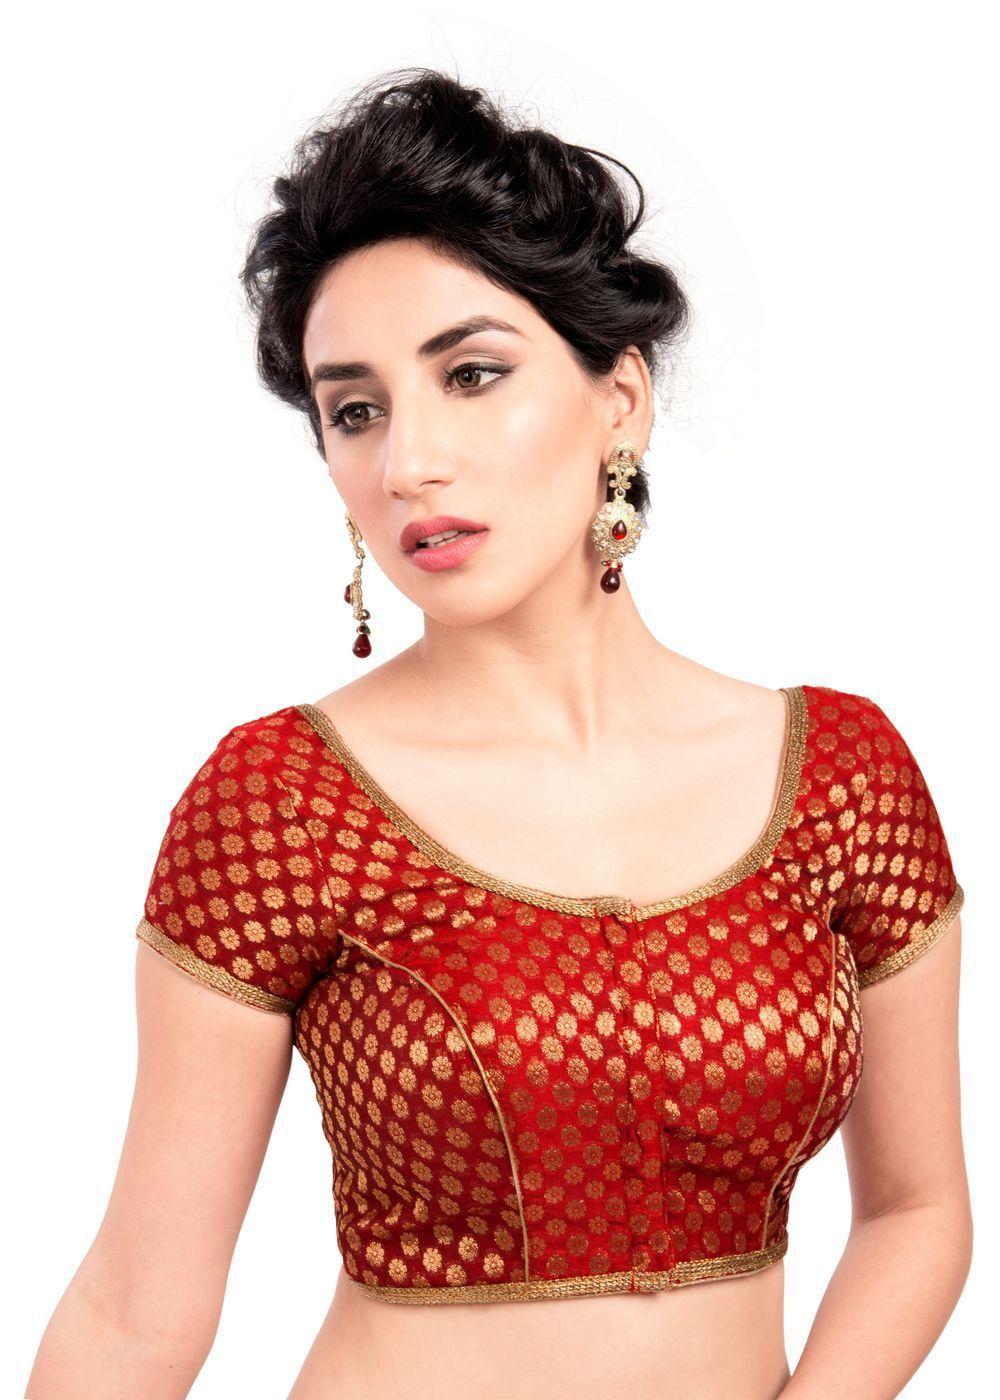 34a57c2e1e Enchanting Red Brocade Ready-made Party-wear Indian Saree Blouse - 86b SL